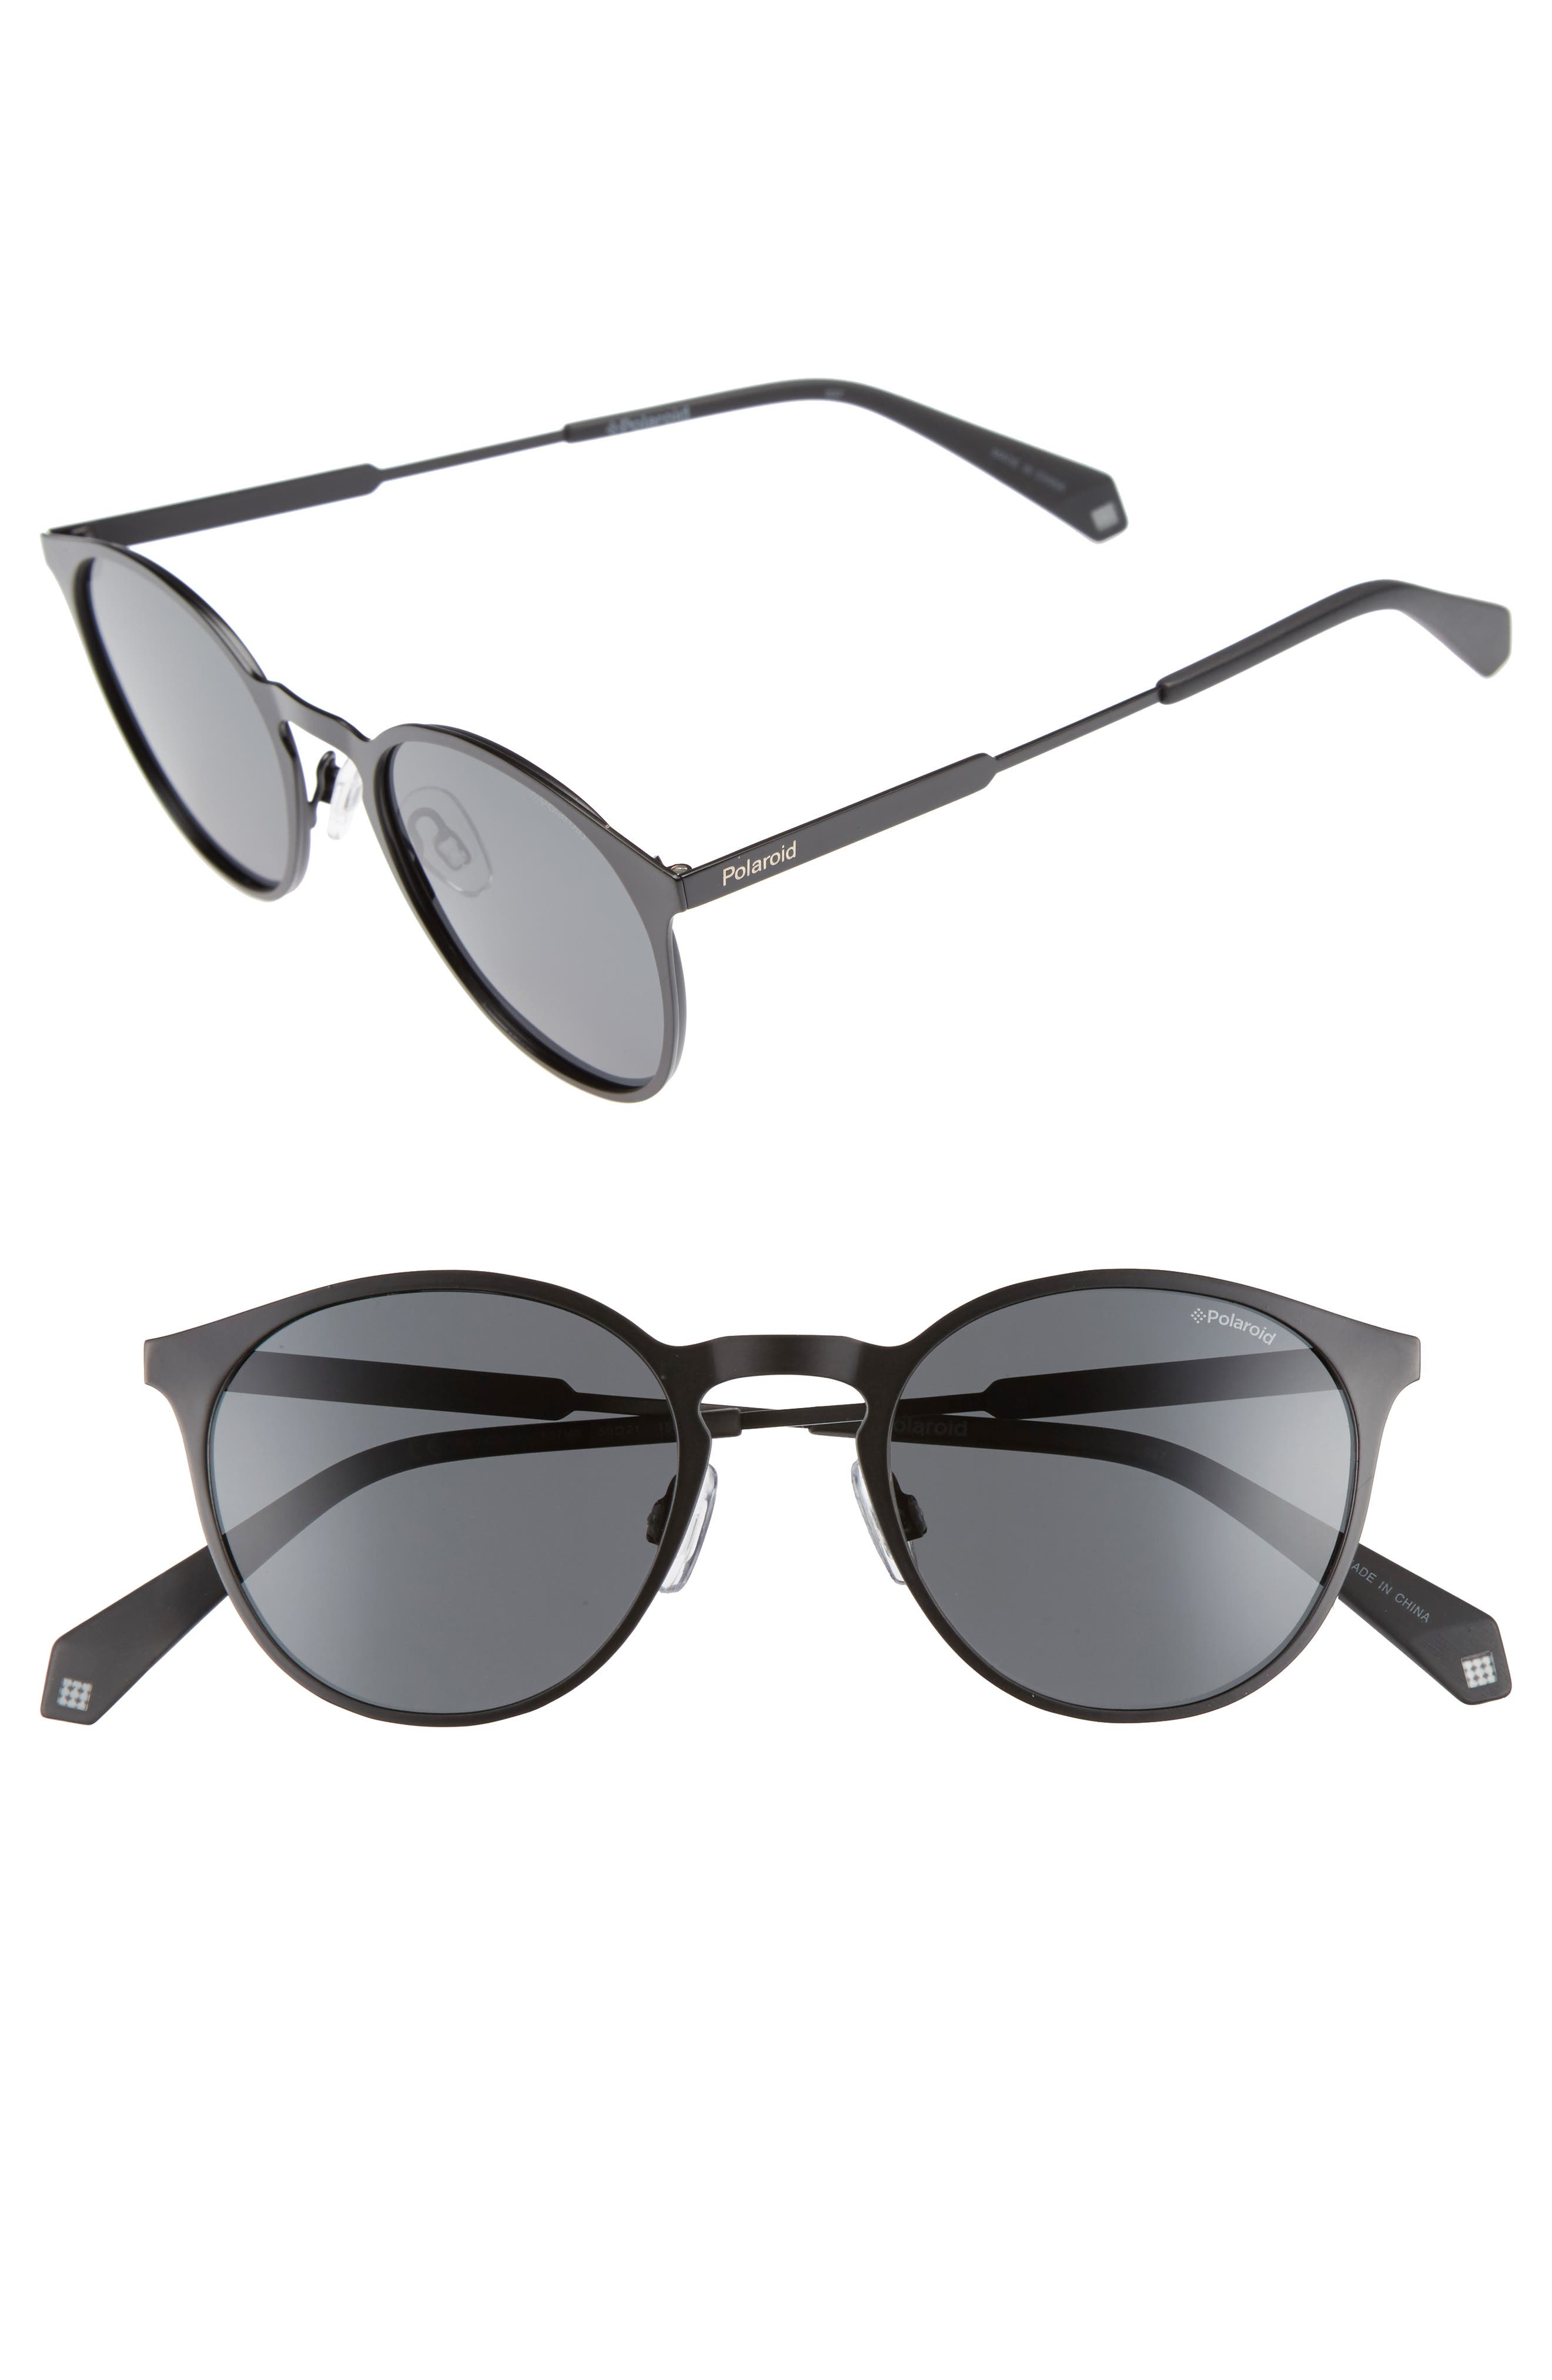 POLAROID EYEWEAR Polaroid 50mm Round Polarized Sunglasses, Main, color, 002